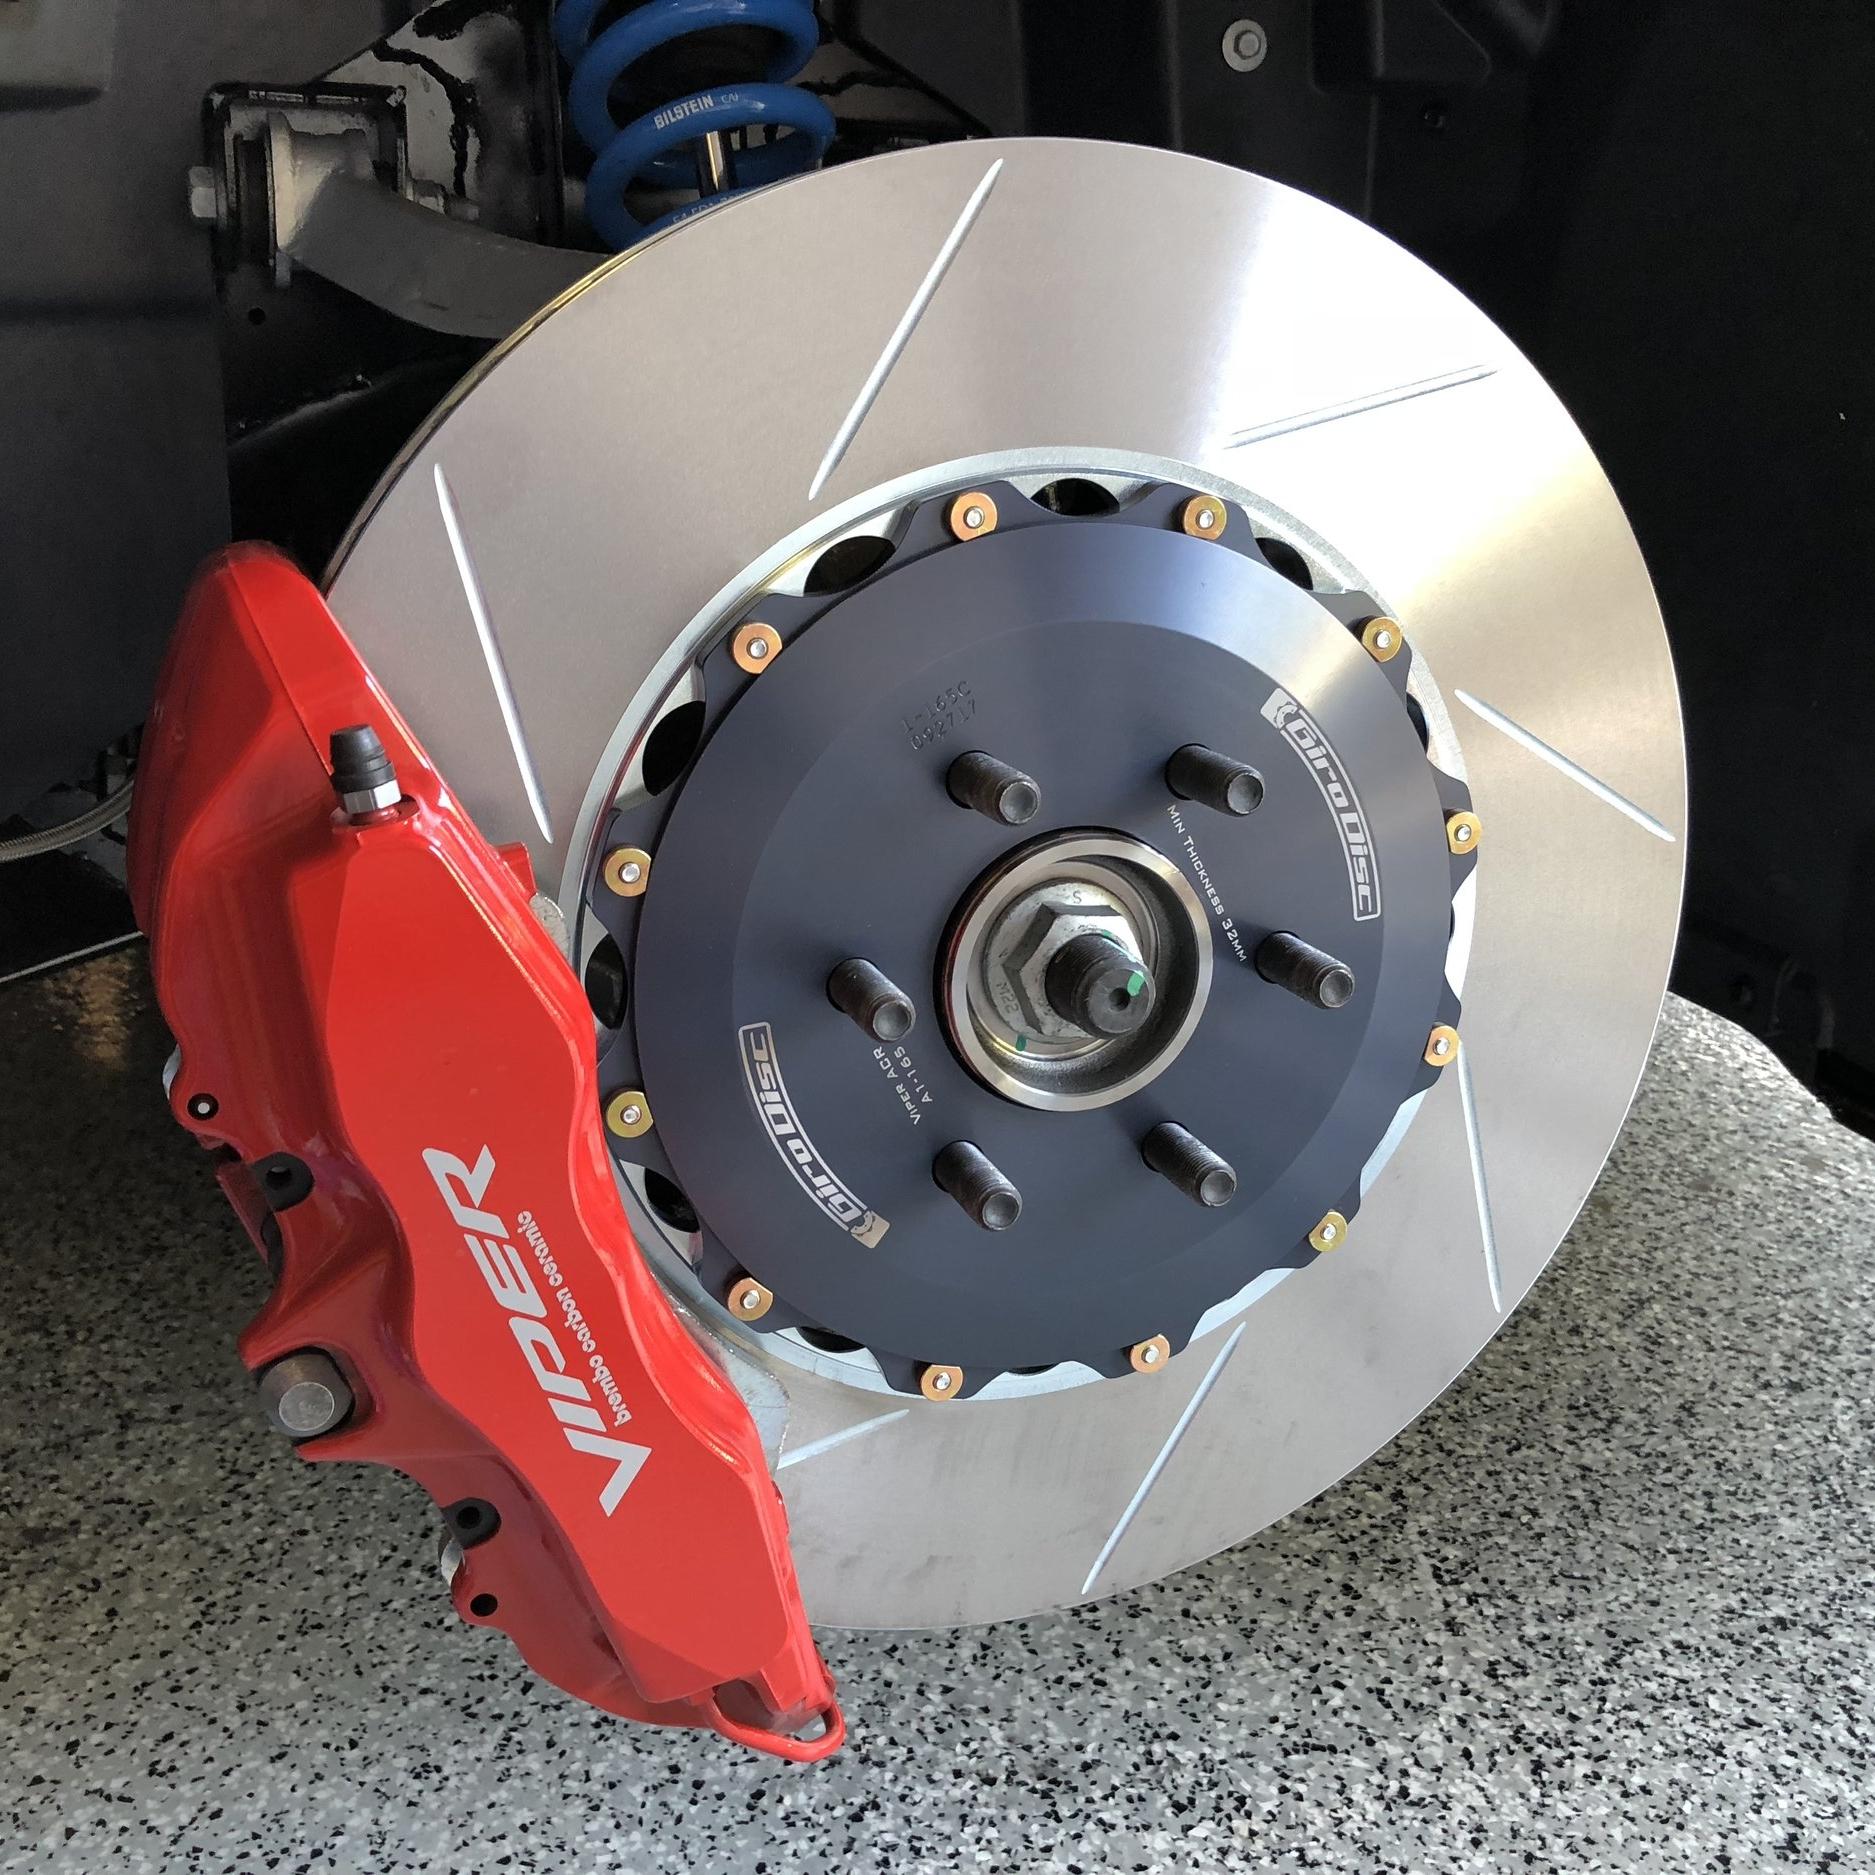 Girodisc ACR-E installed front